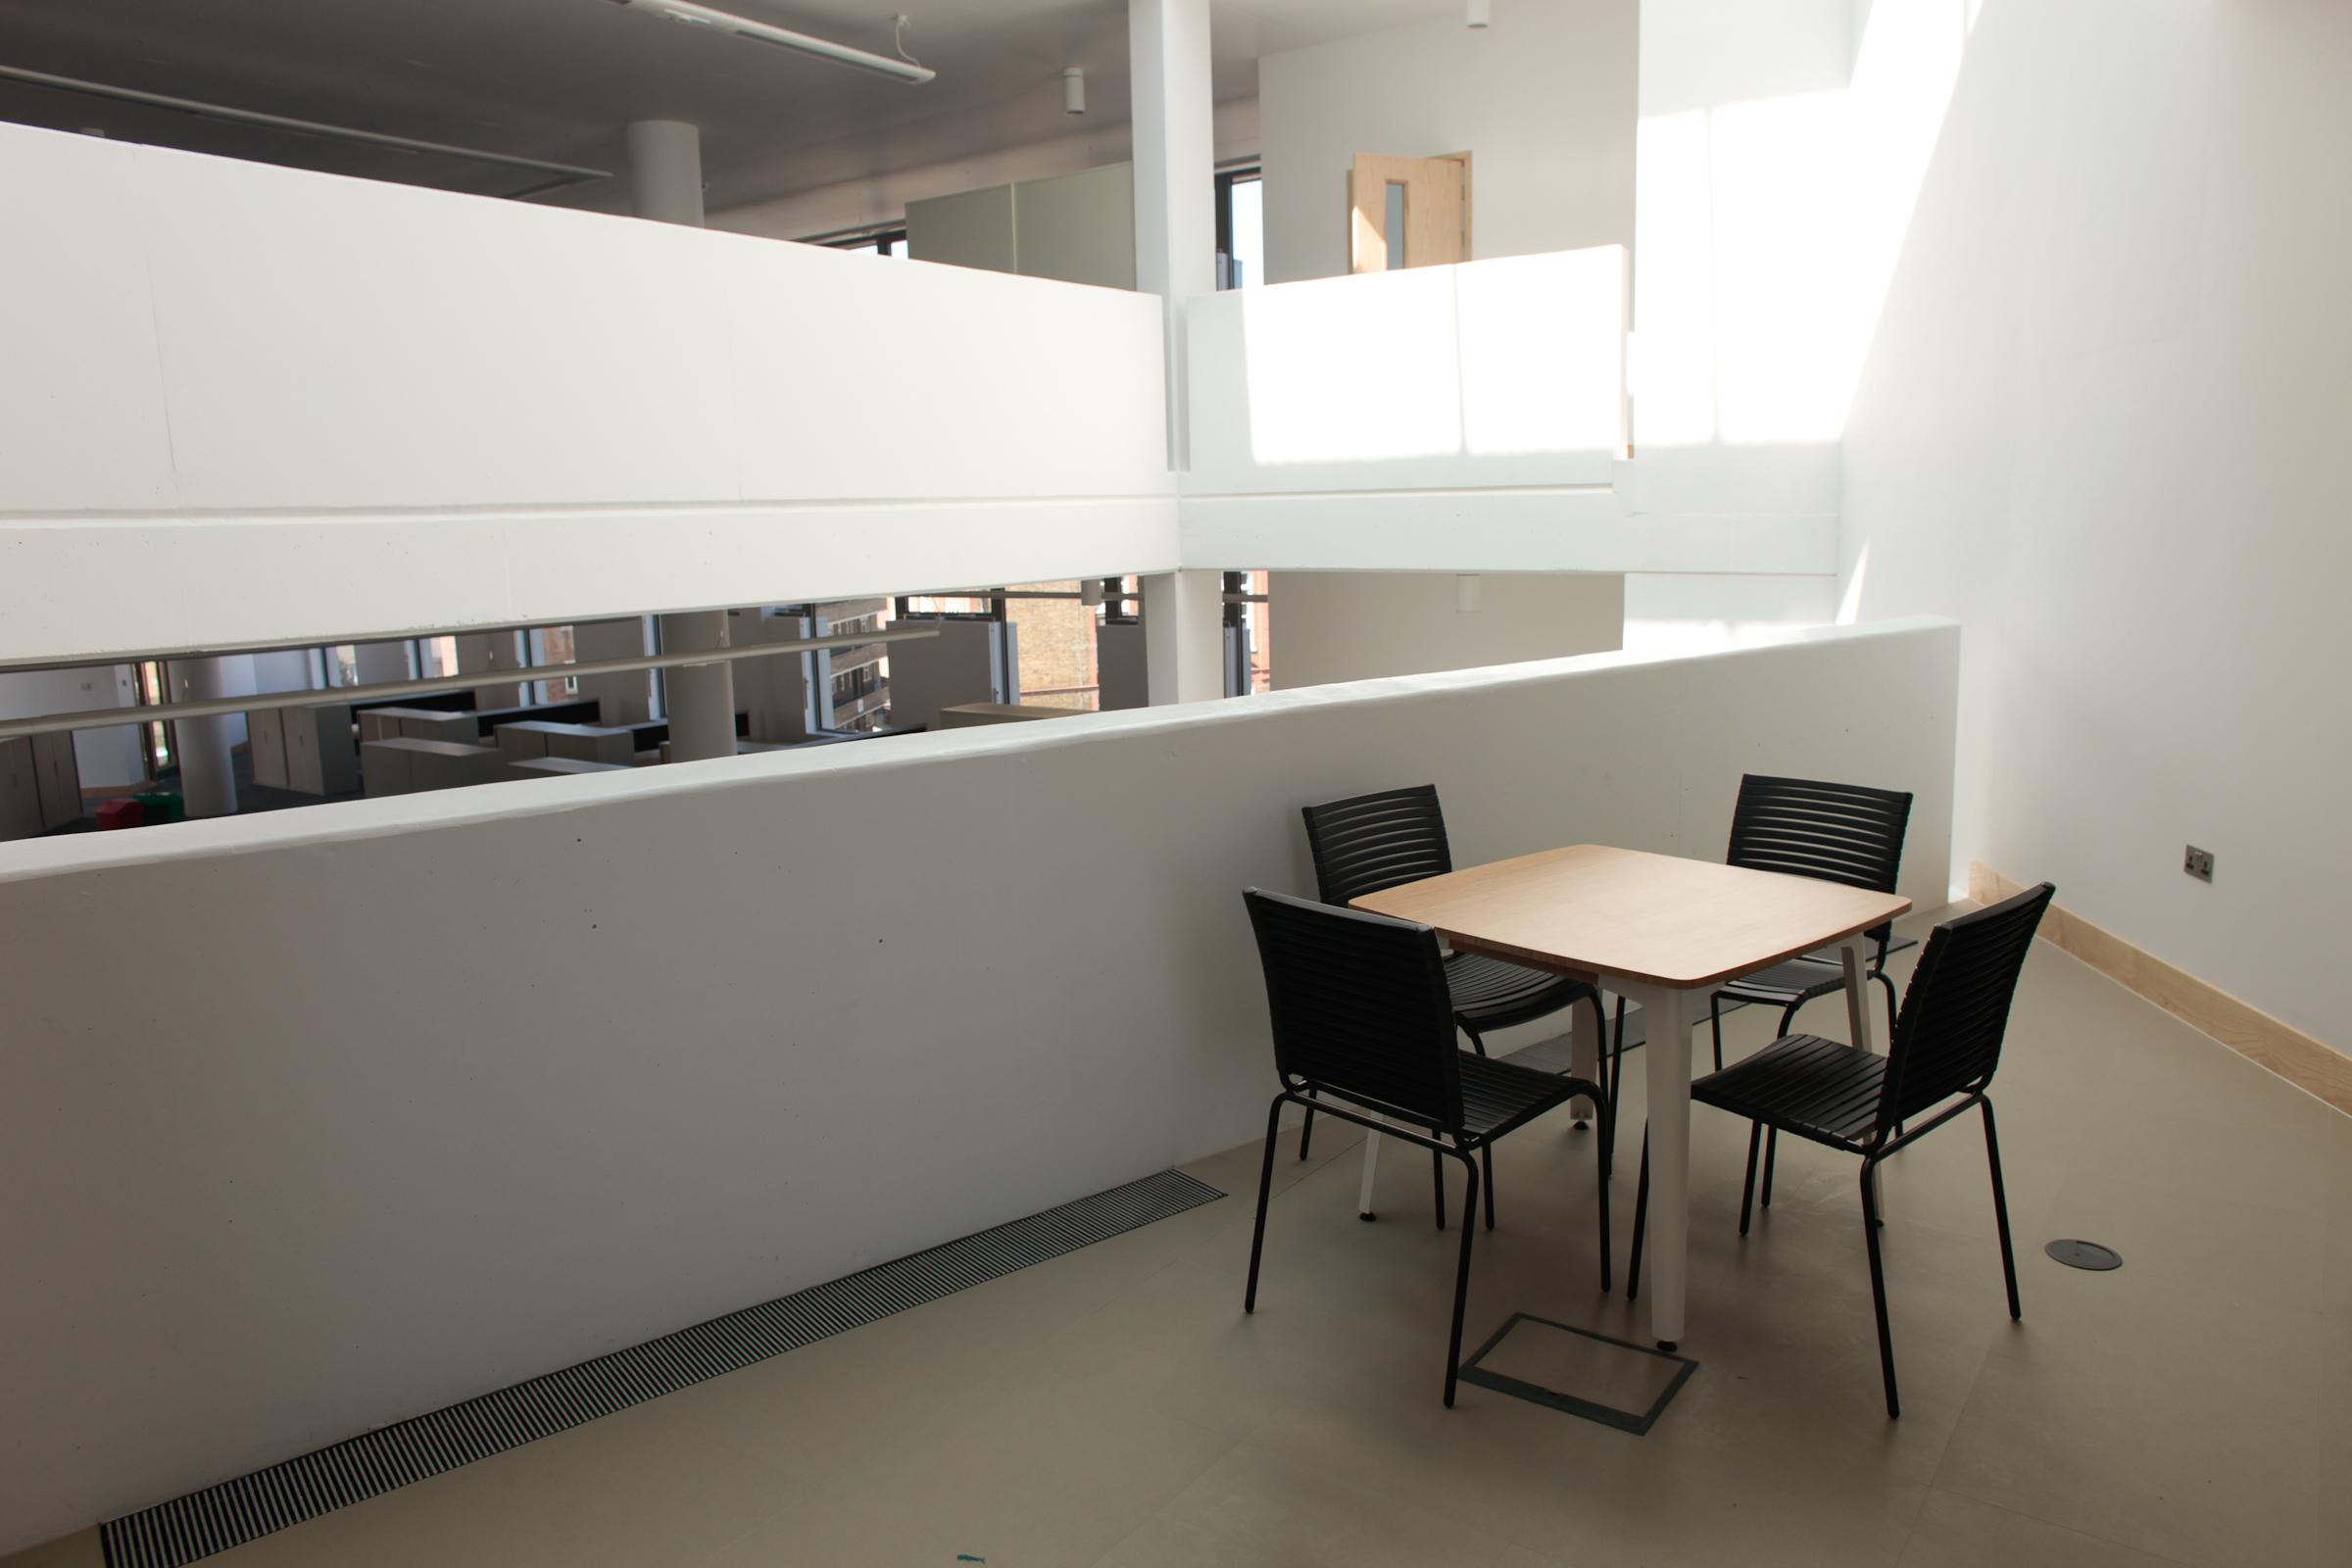 pli design ltd press office hosted by press dispensary